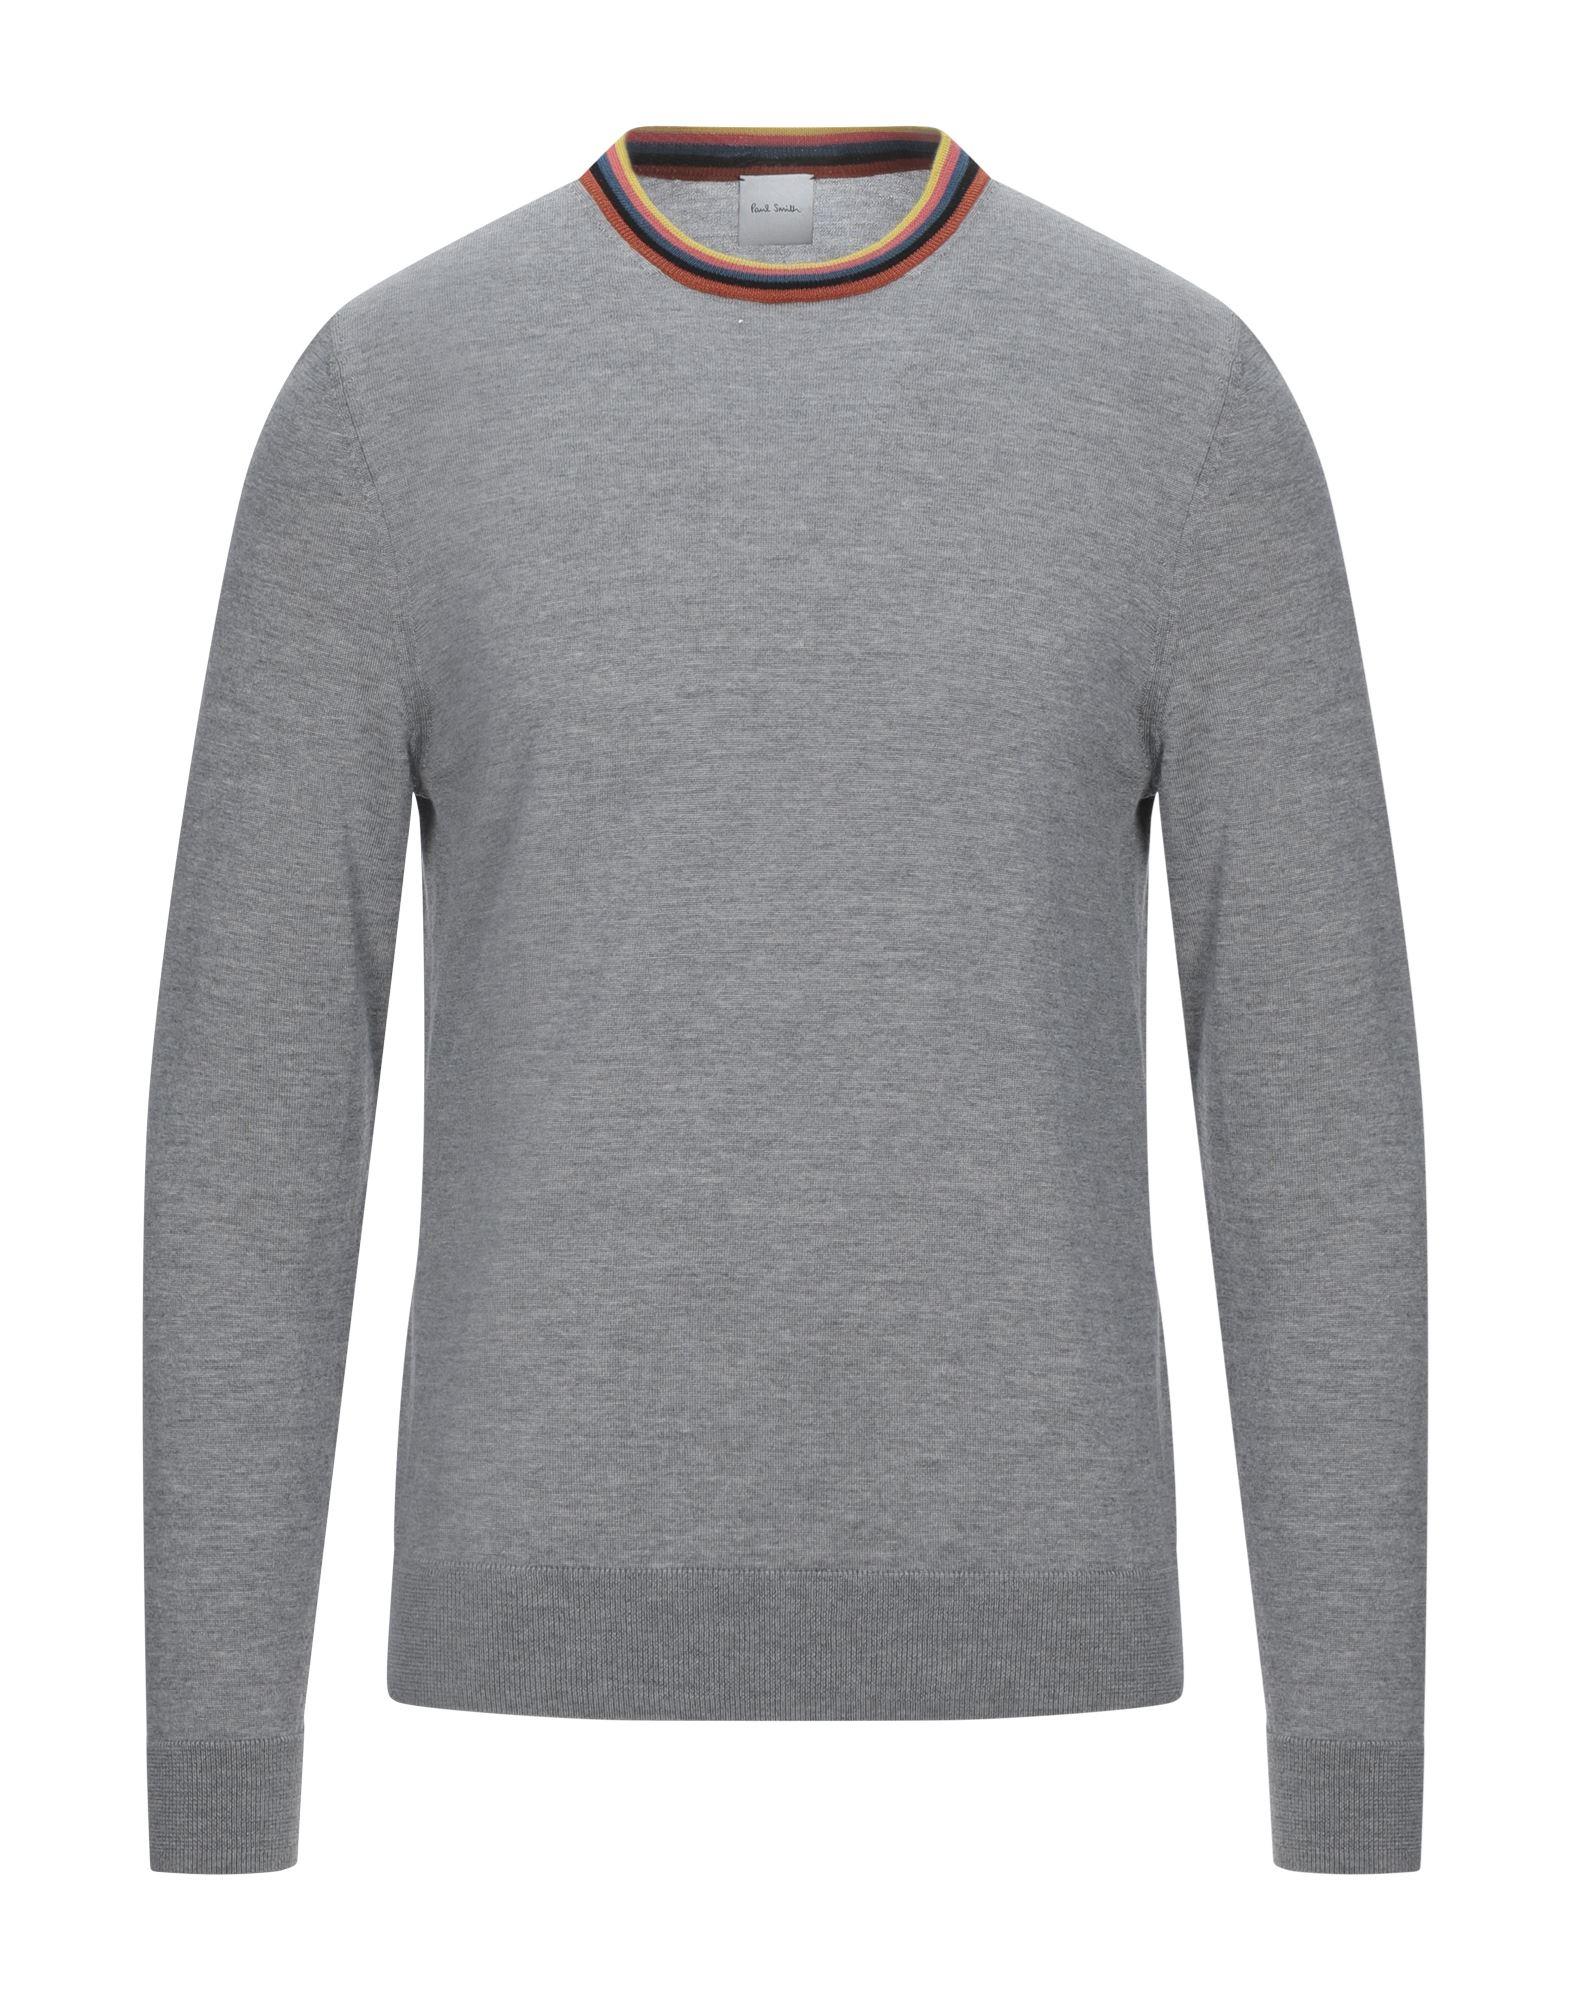 PAUL SMITH Sweaters - Item 14095861